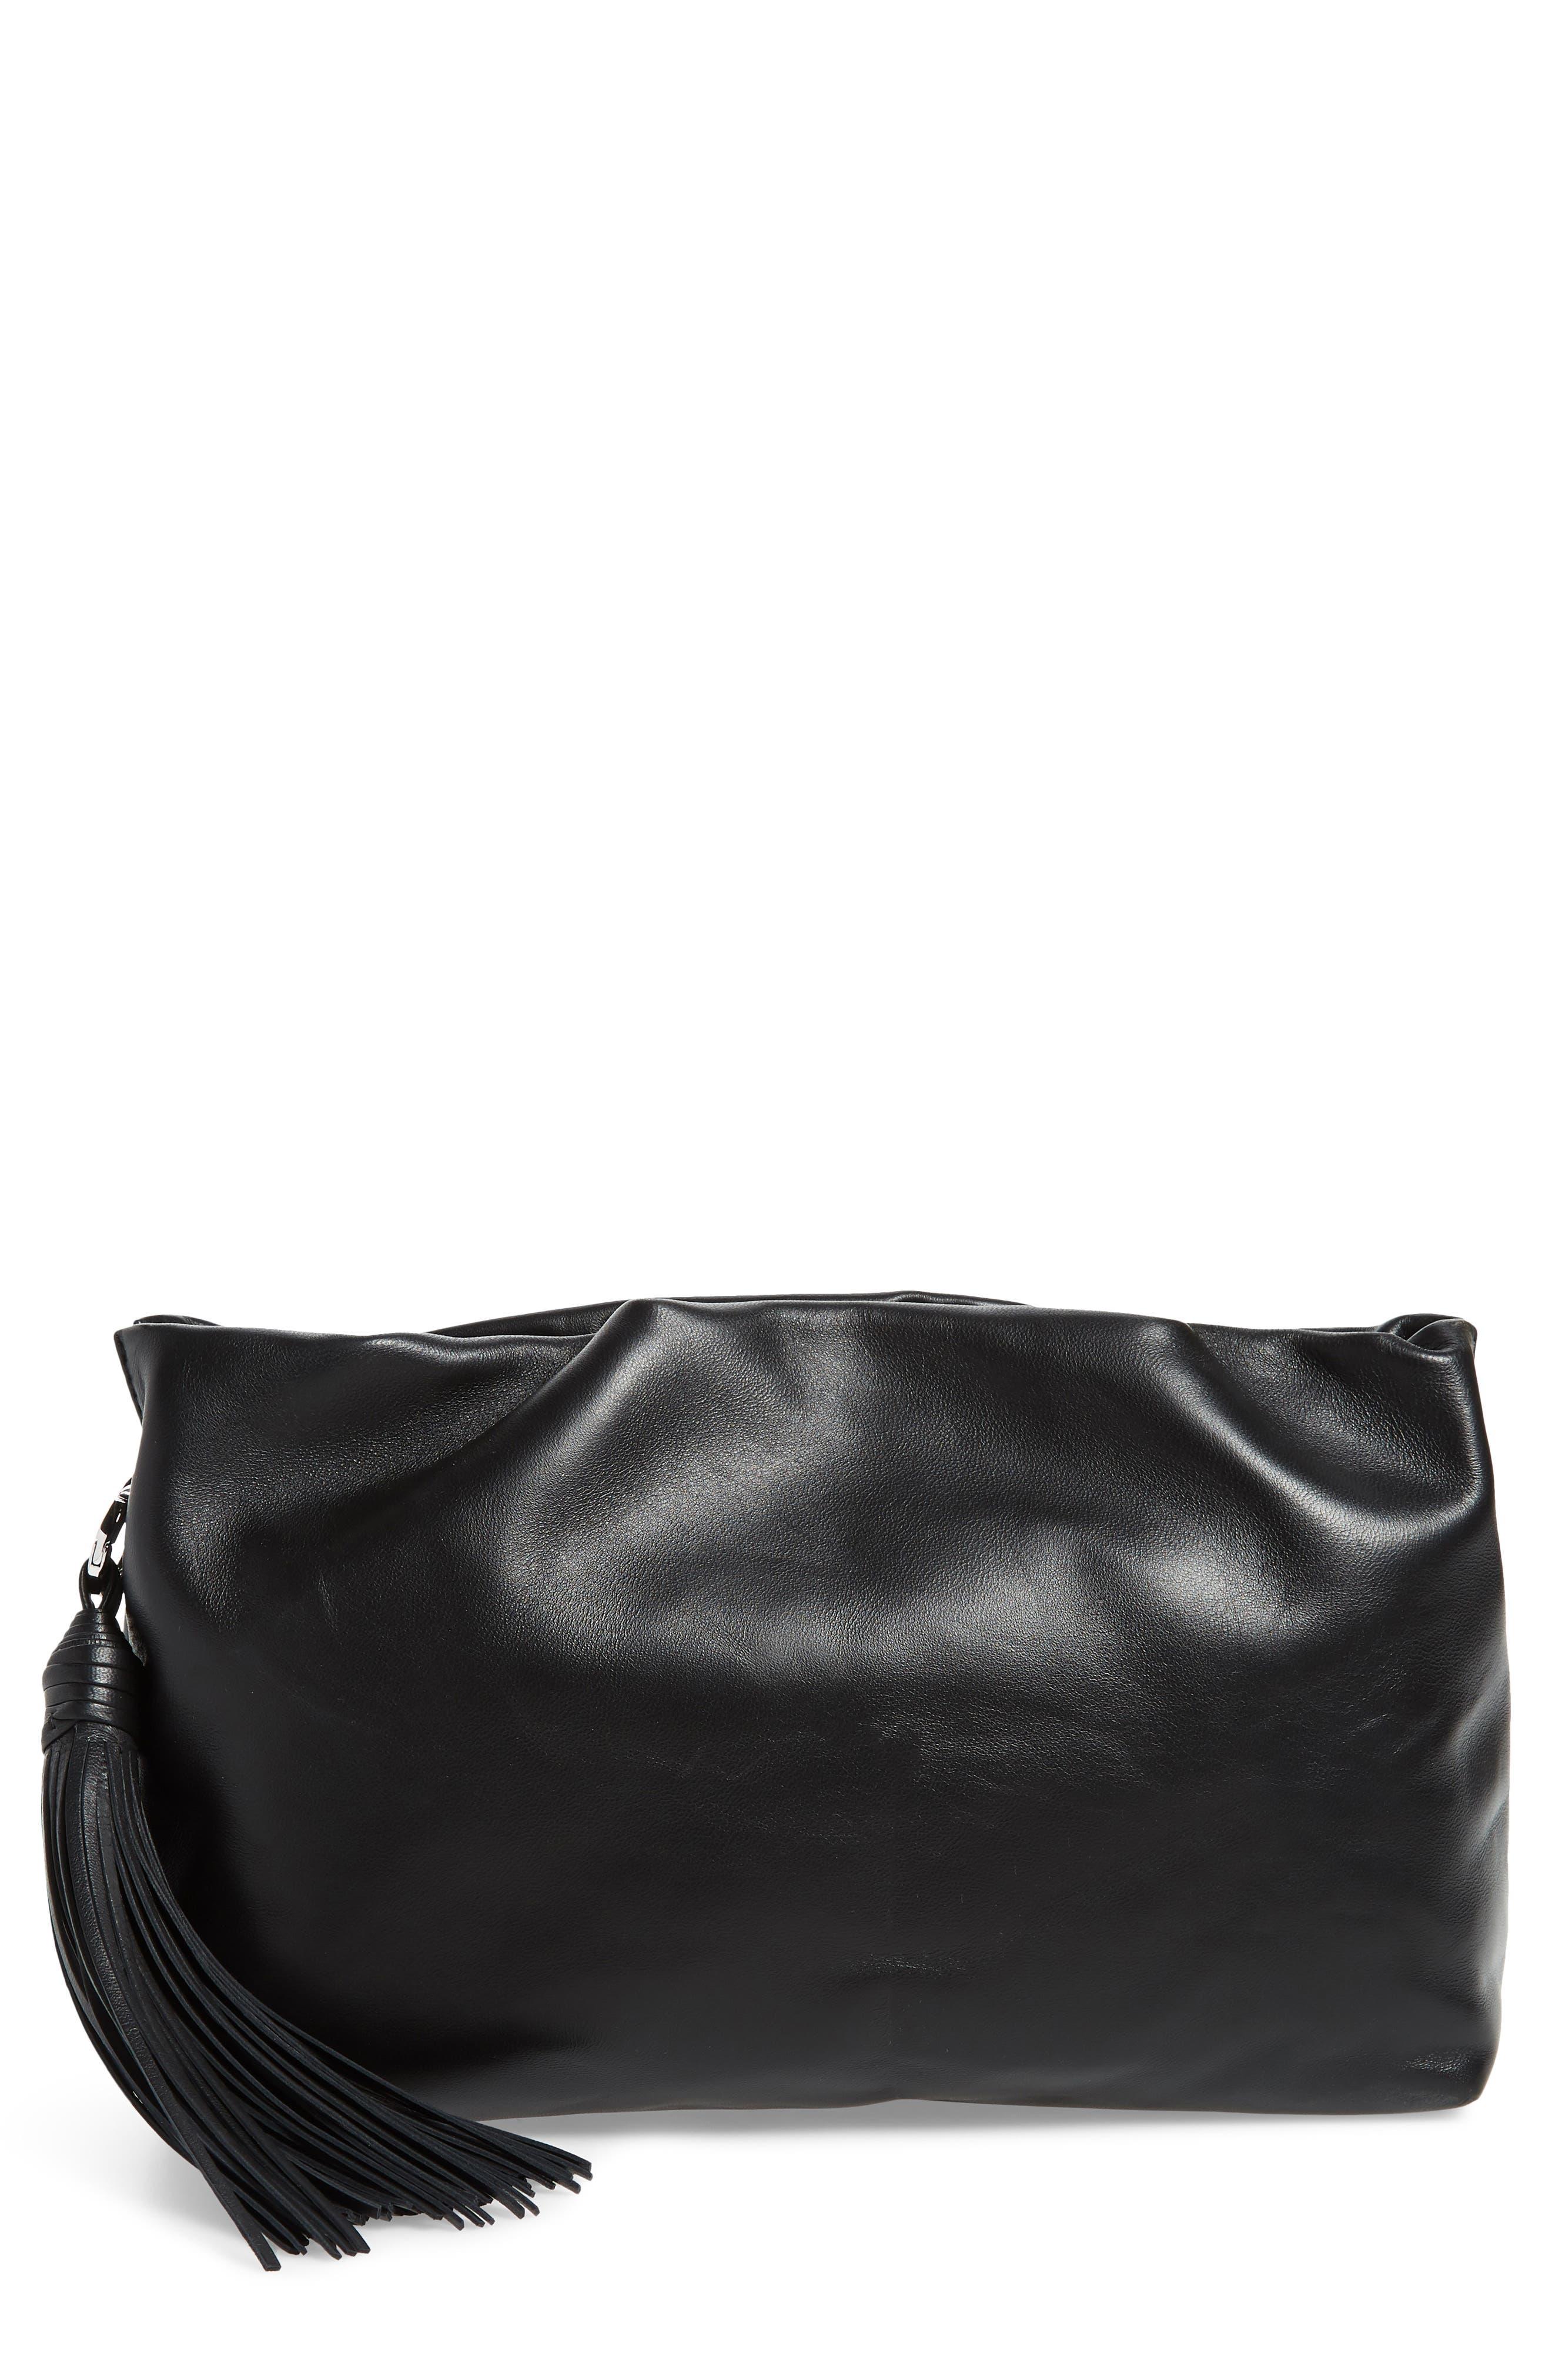 Rebecca Minkoff Ruby Ruched Leather Clutch